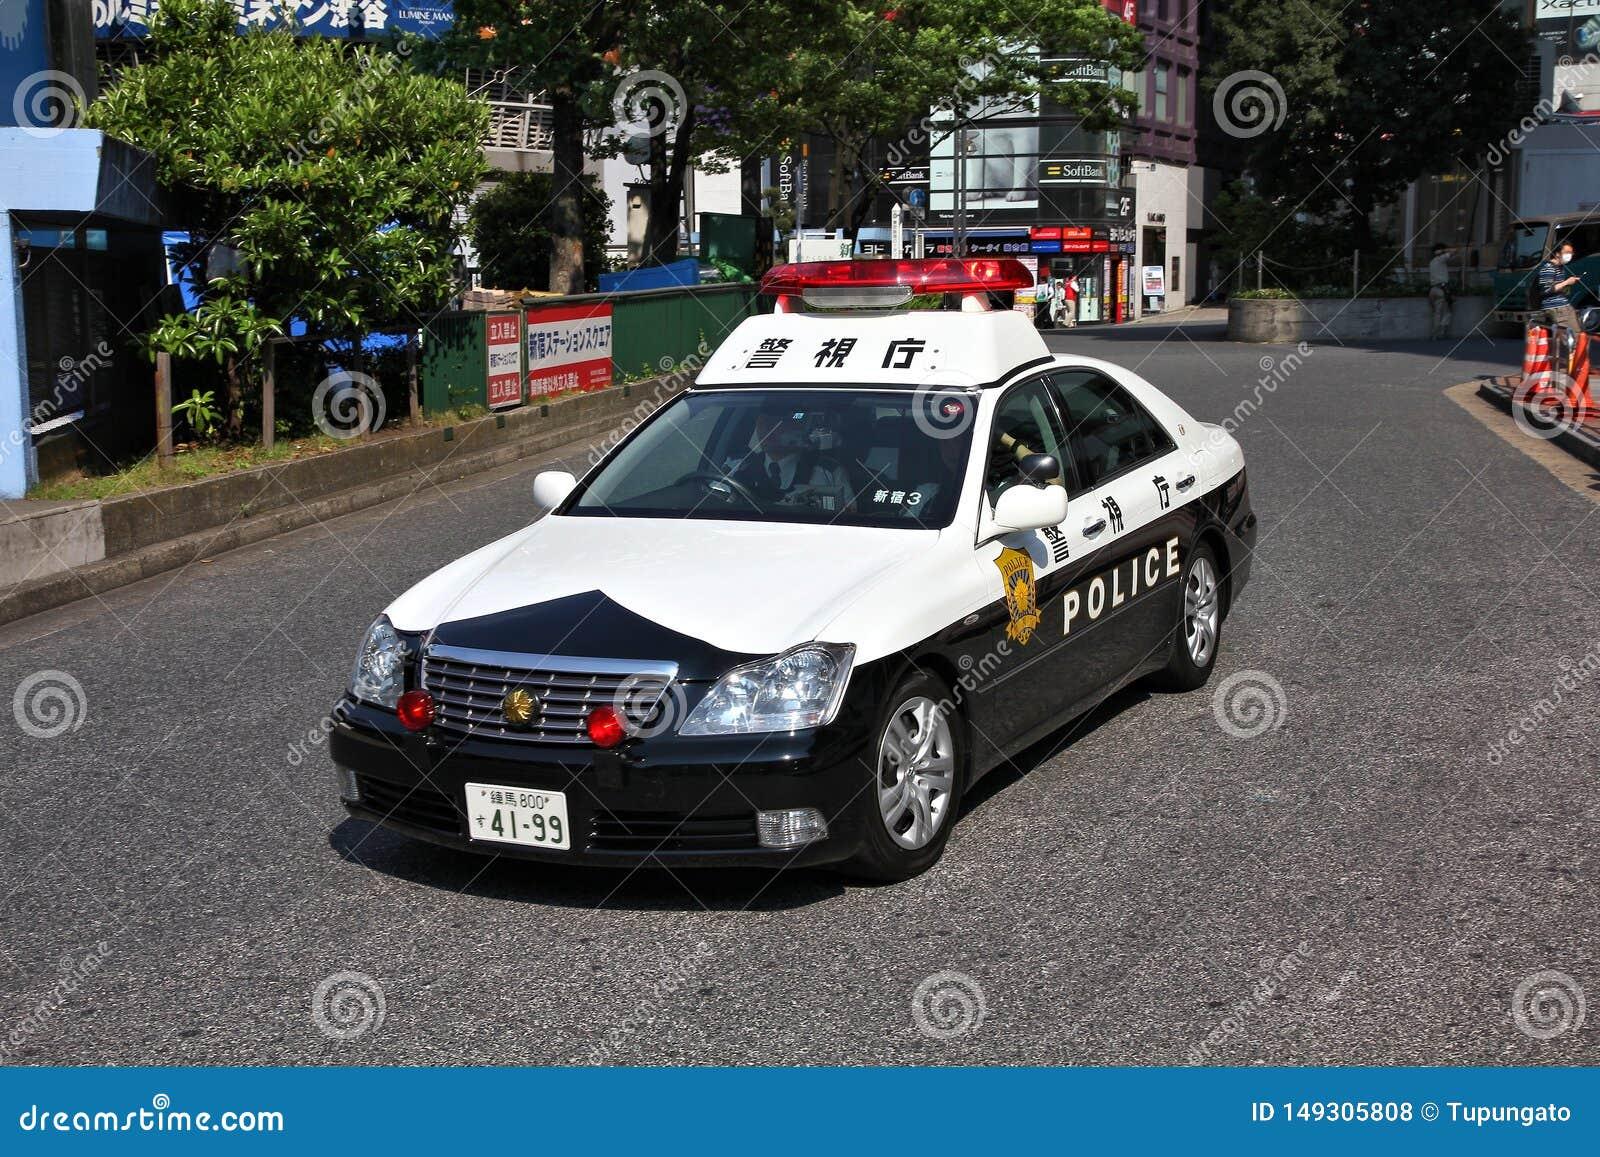 Tokyo police car editorial stock photo. Image of japan ...